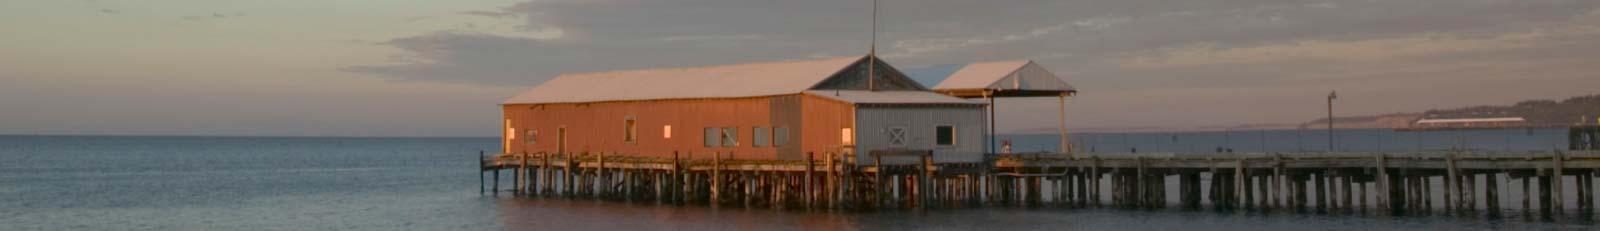 Clallam County Waterfront Market Statistics